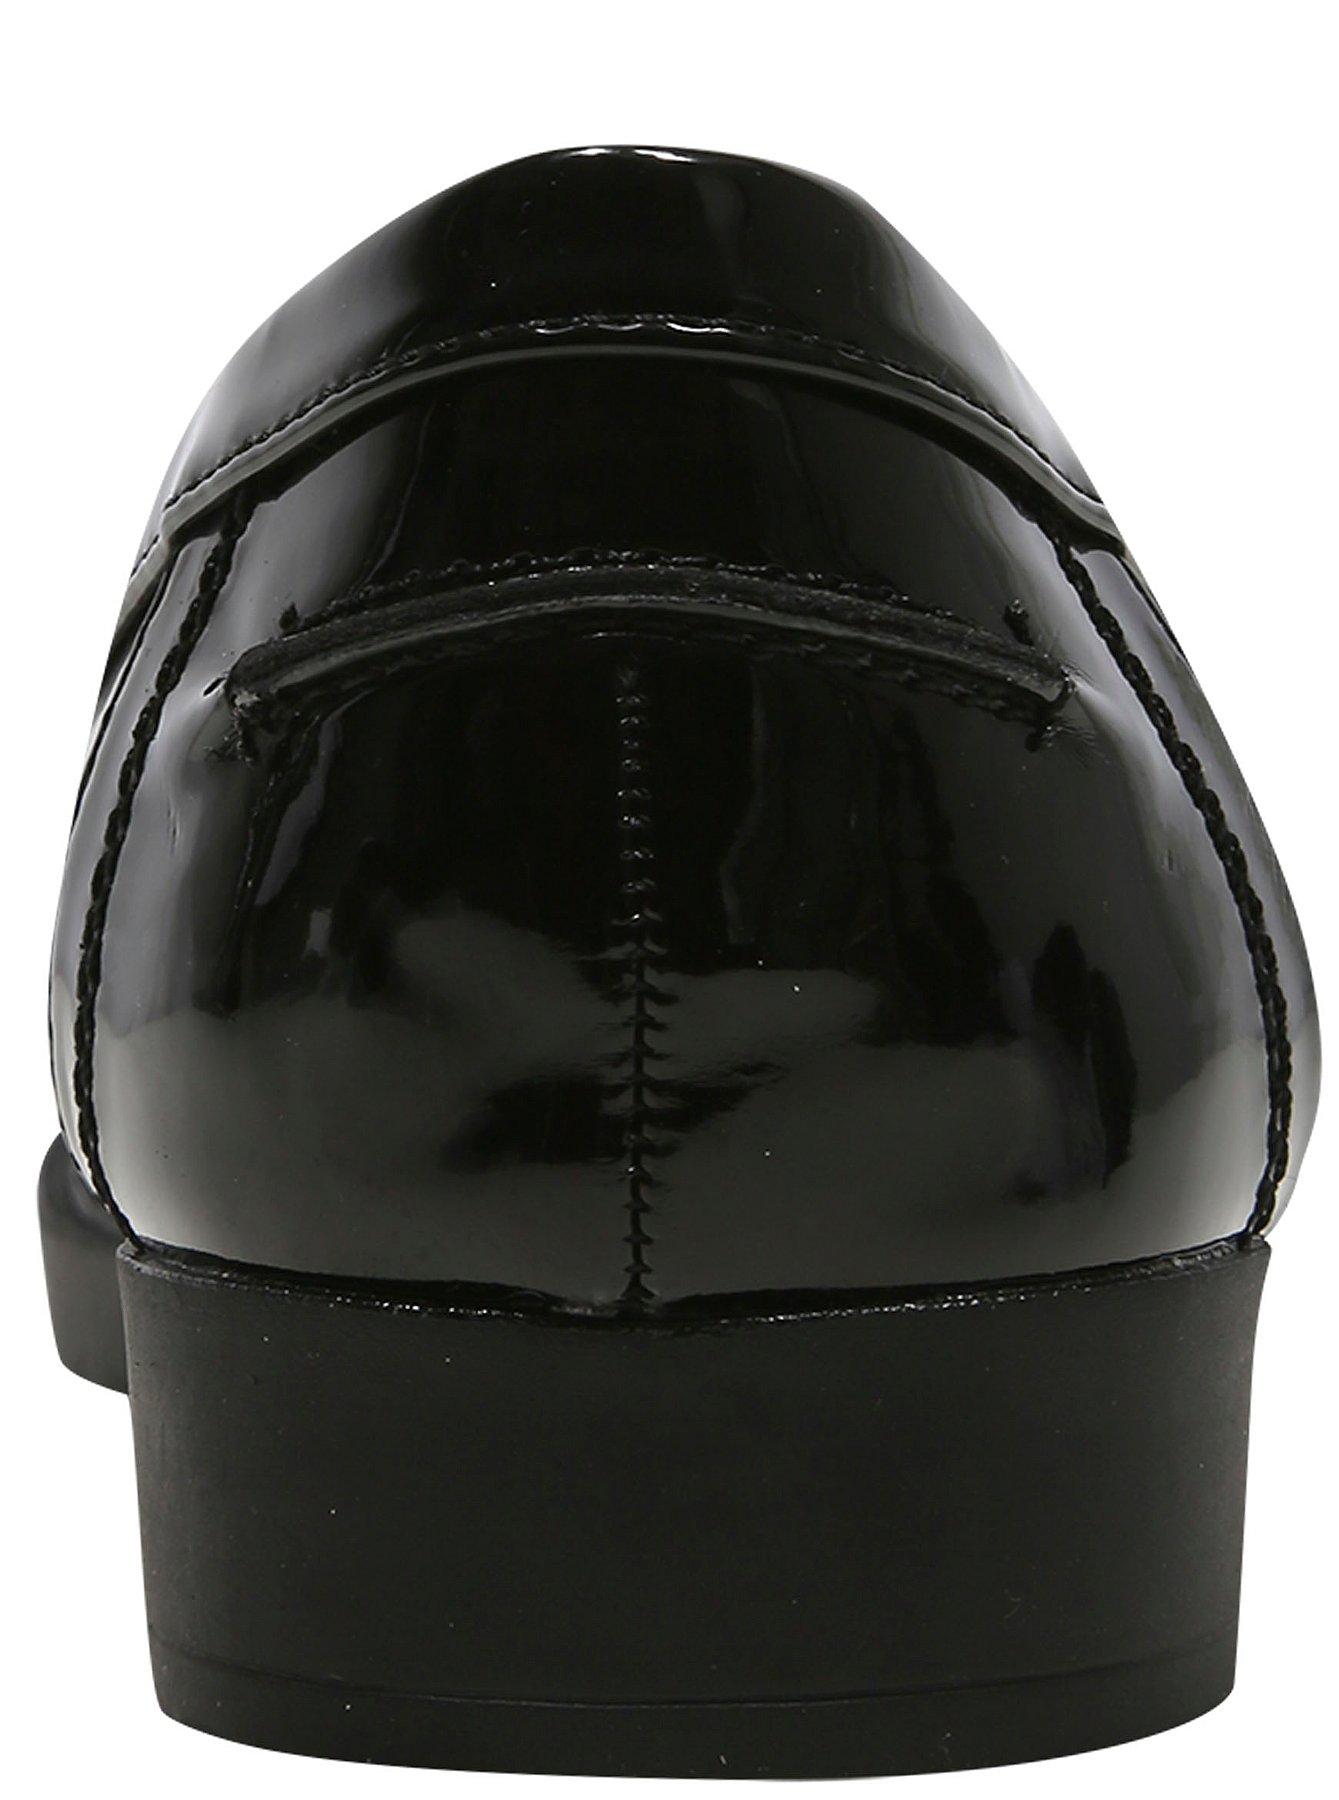 Black sandals asda - Black Sandals Asda 48